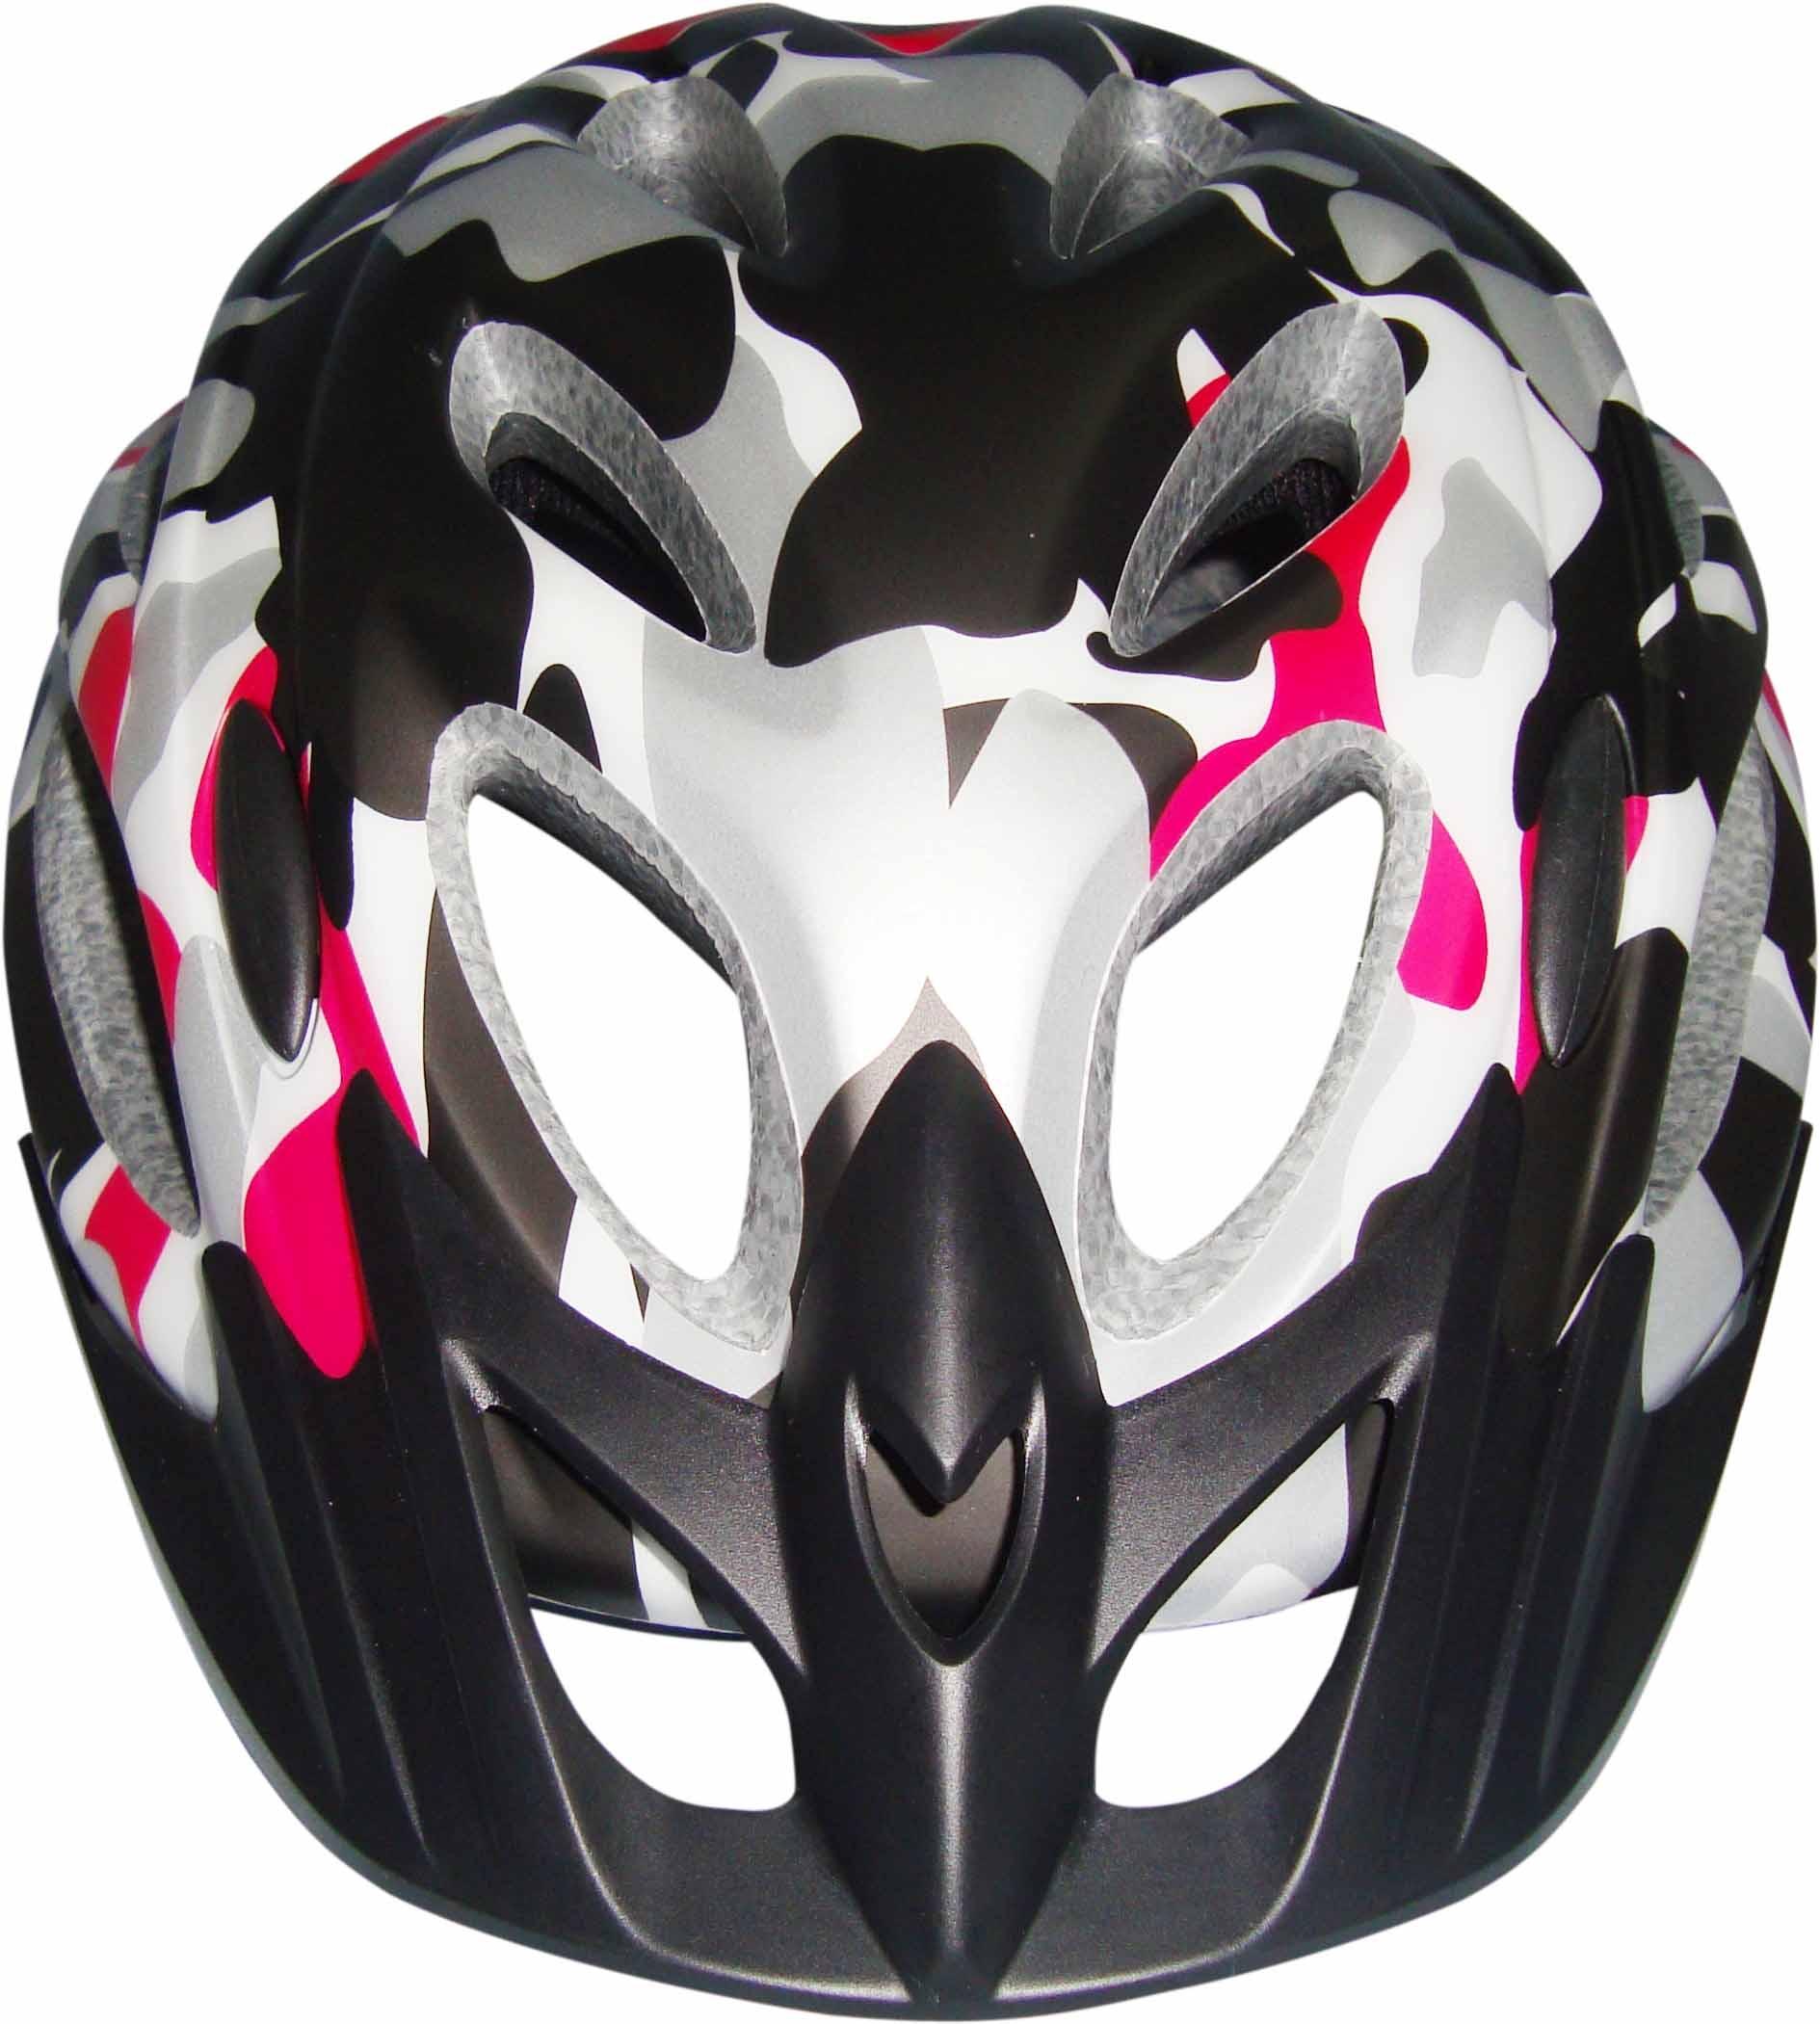 Certified Mountain Bike Helmet Light Best Helmet Light